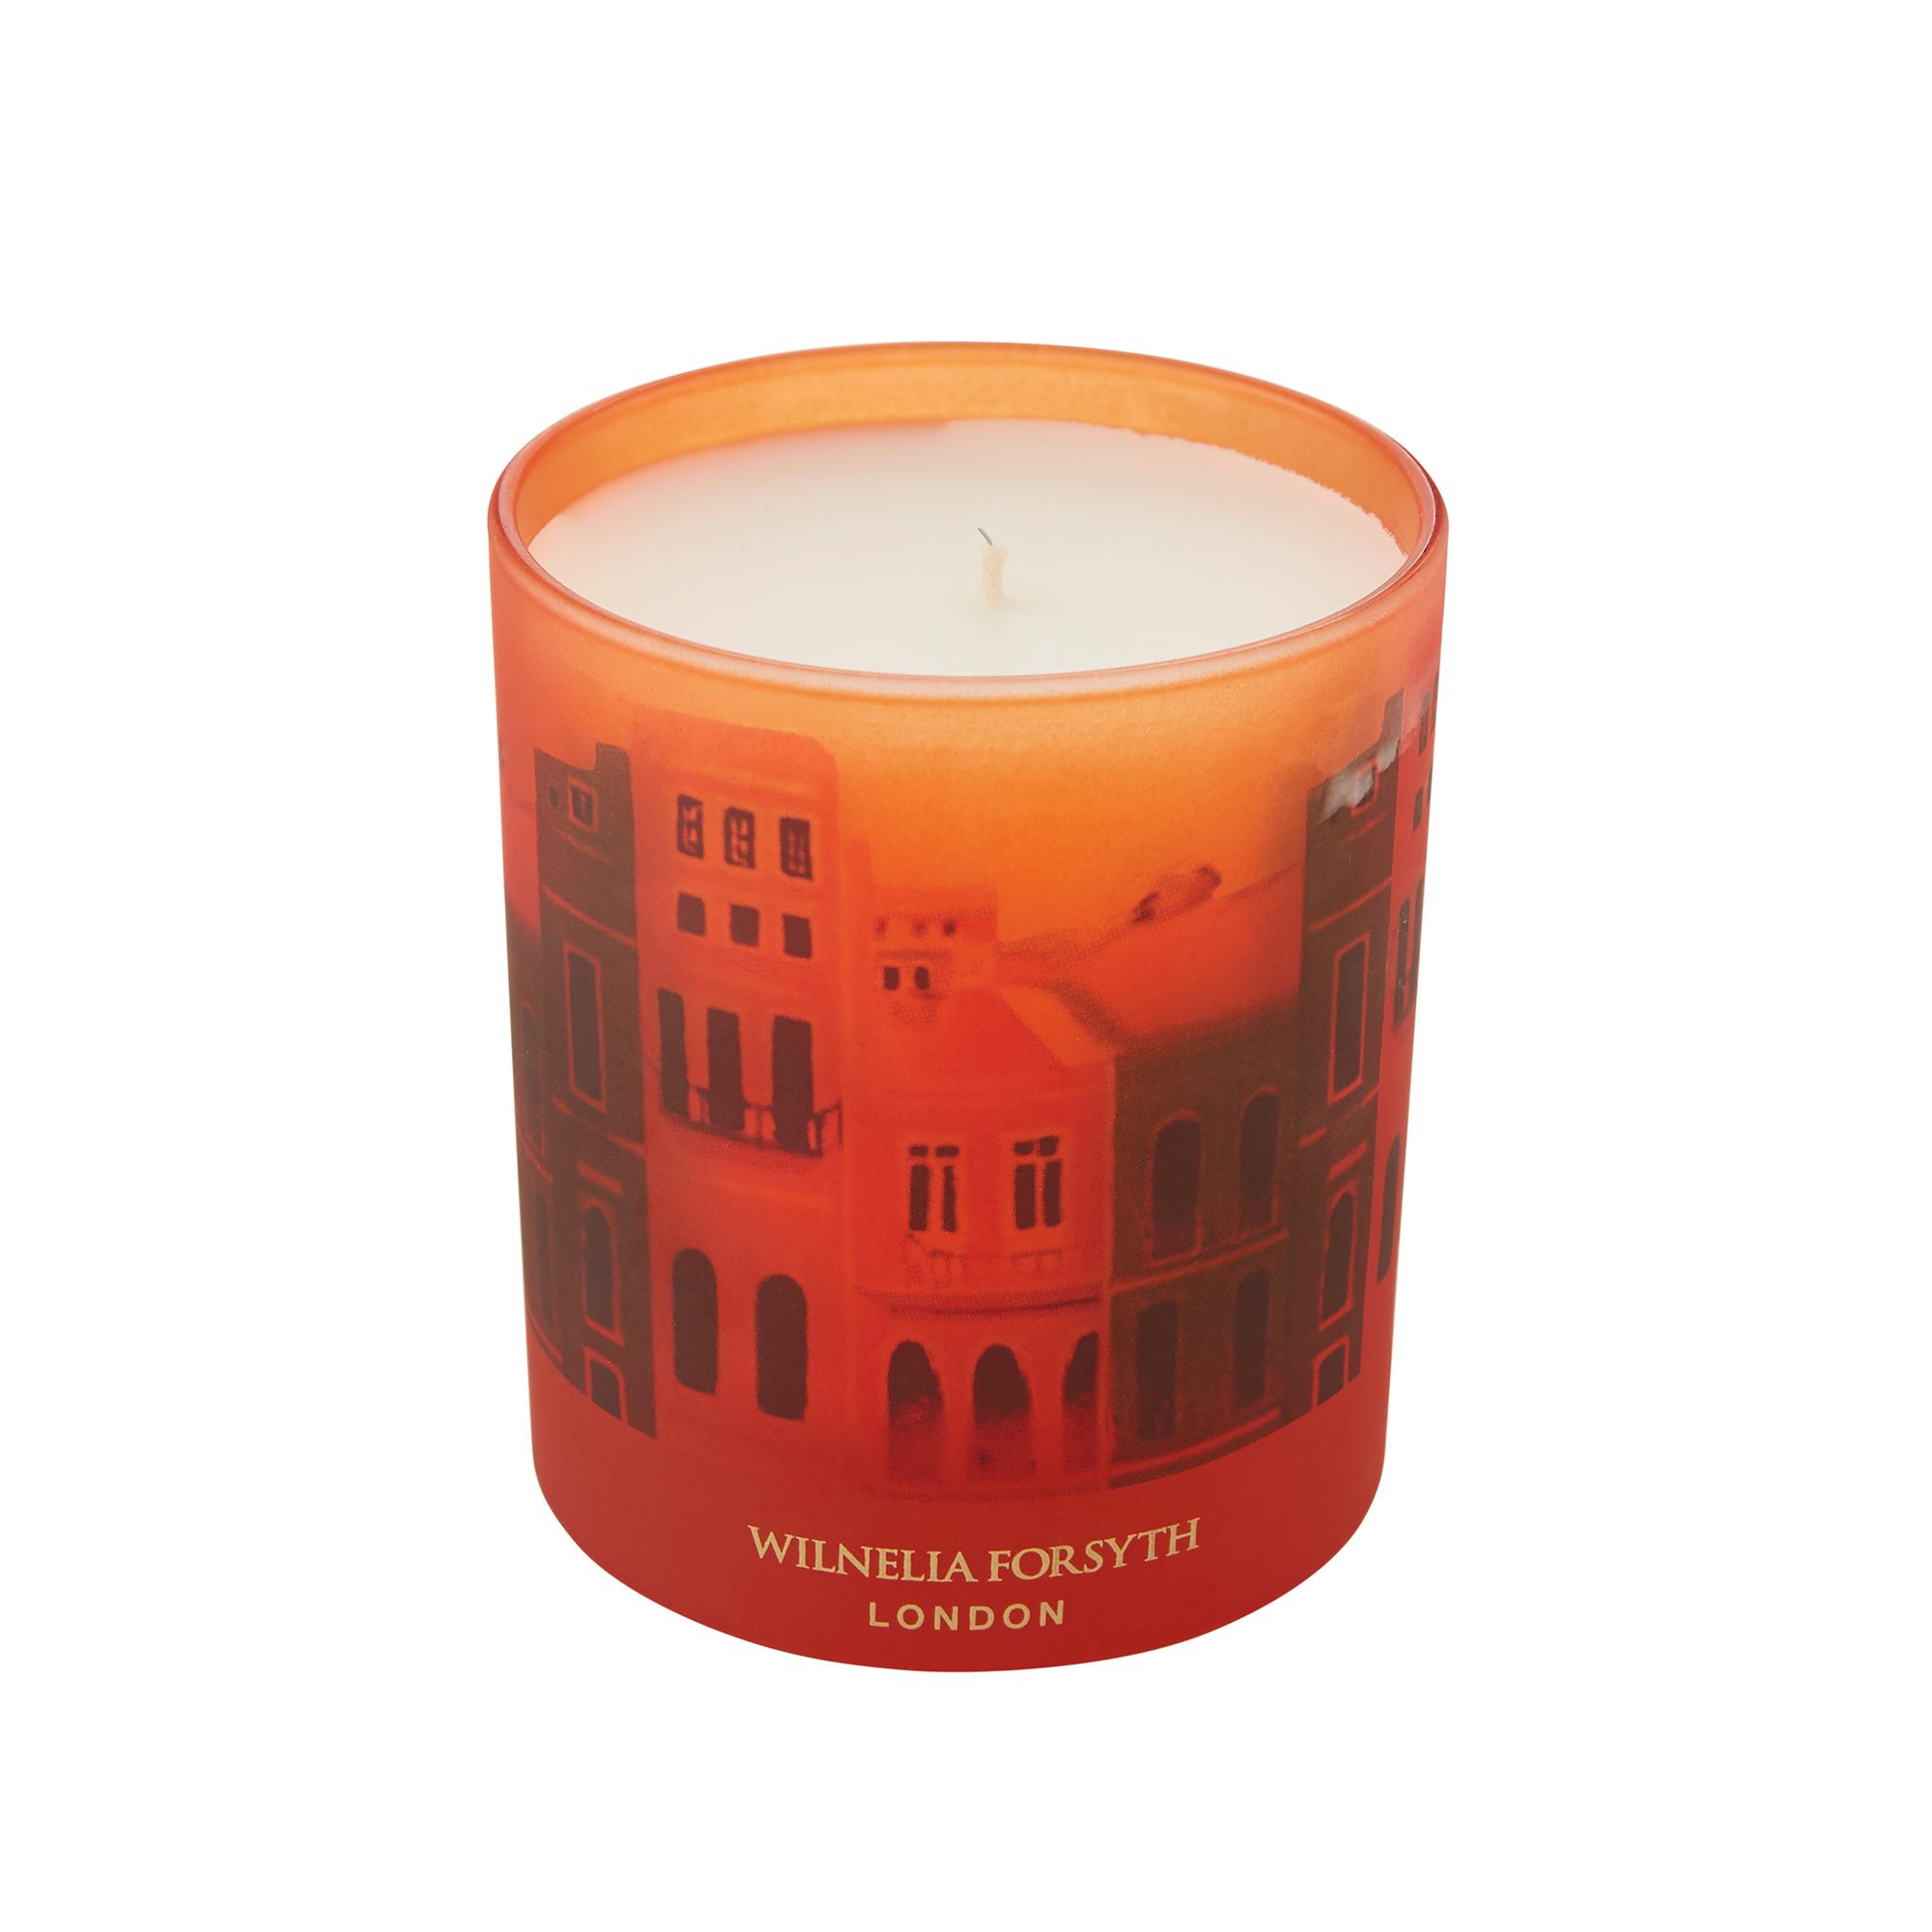 Cunde Amore – Wilnelia Forsyth Candles